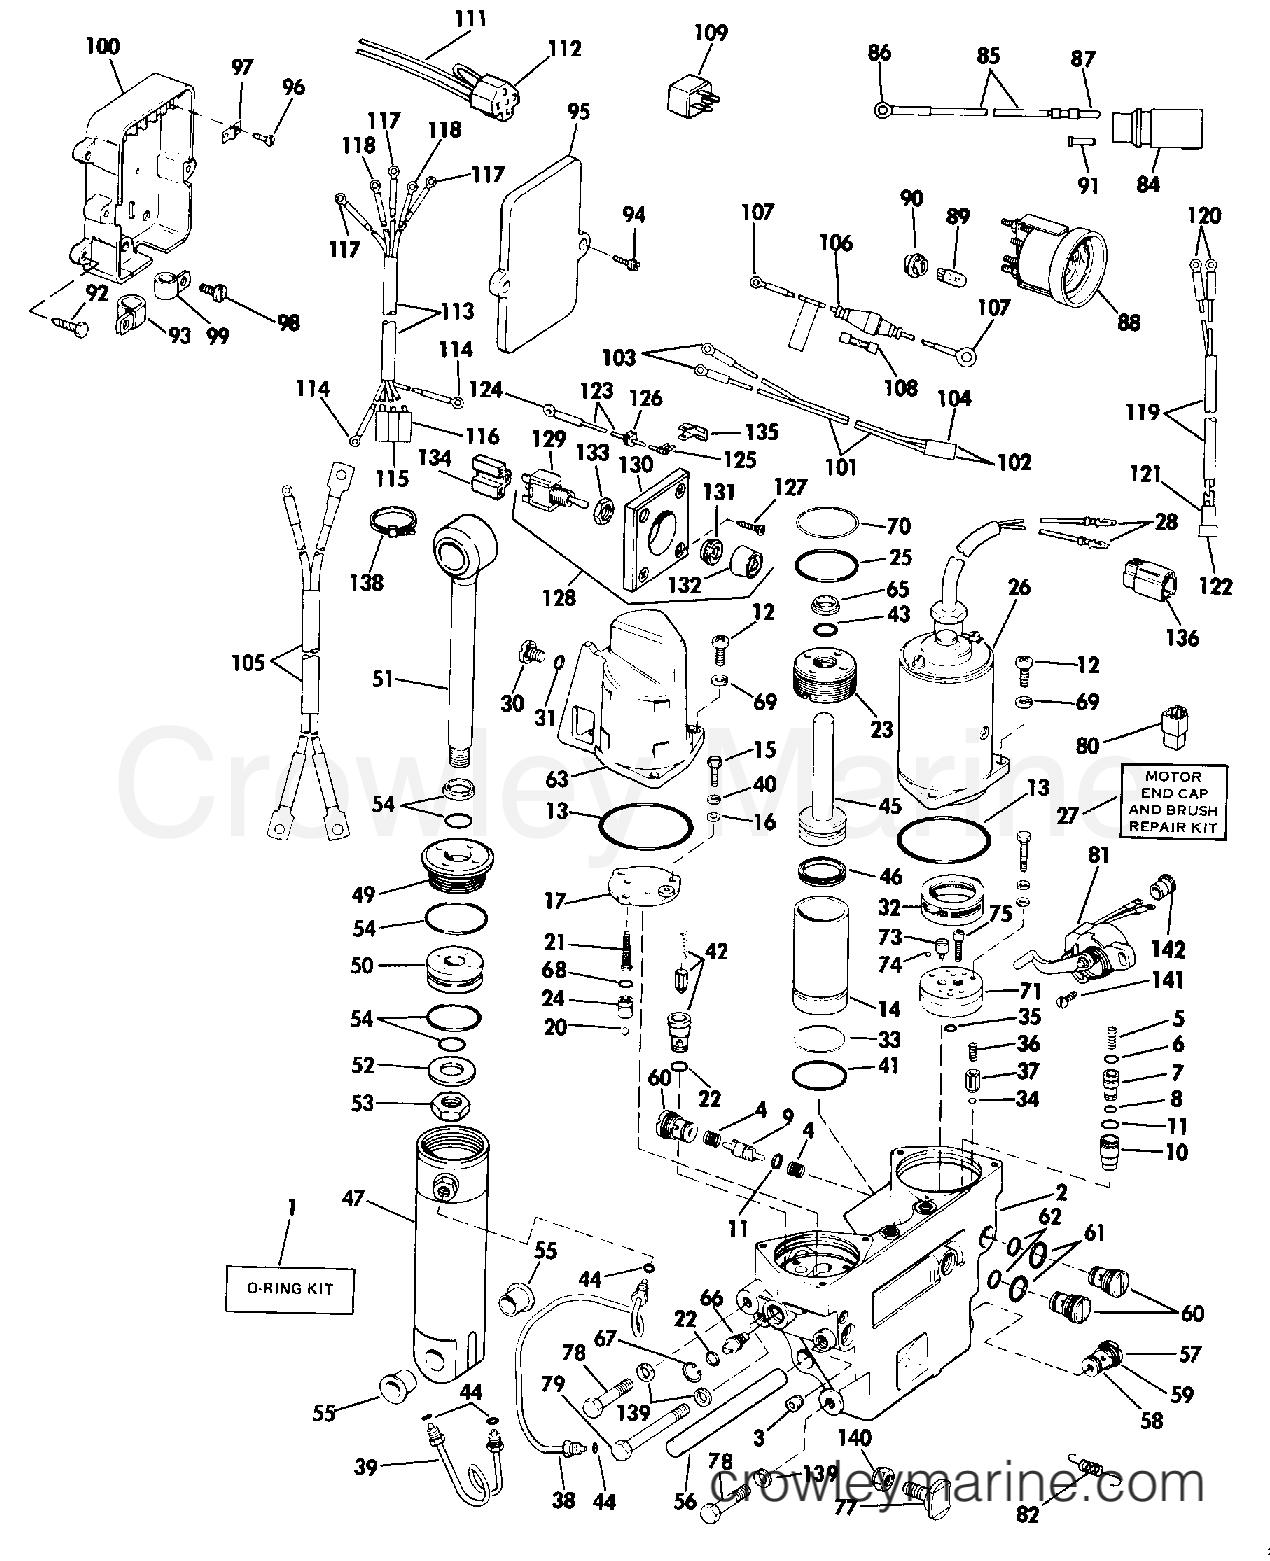 1989 Rigging Parts Accessories - Power Trim & Tilt - POWER TRIM/TILT 60 THRU 110